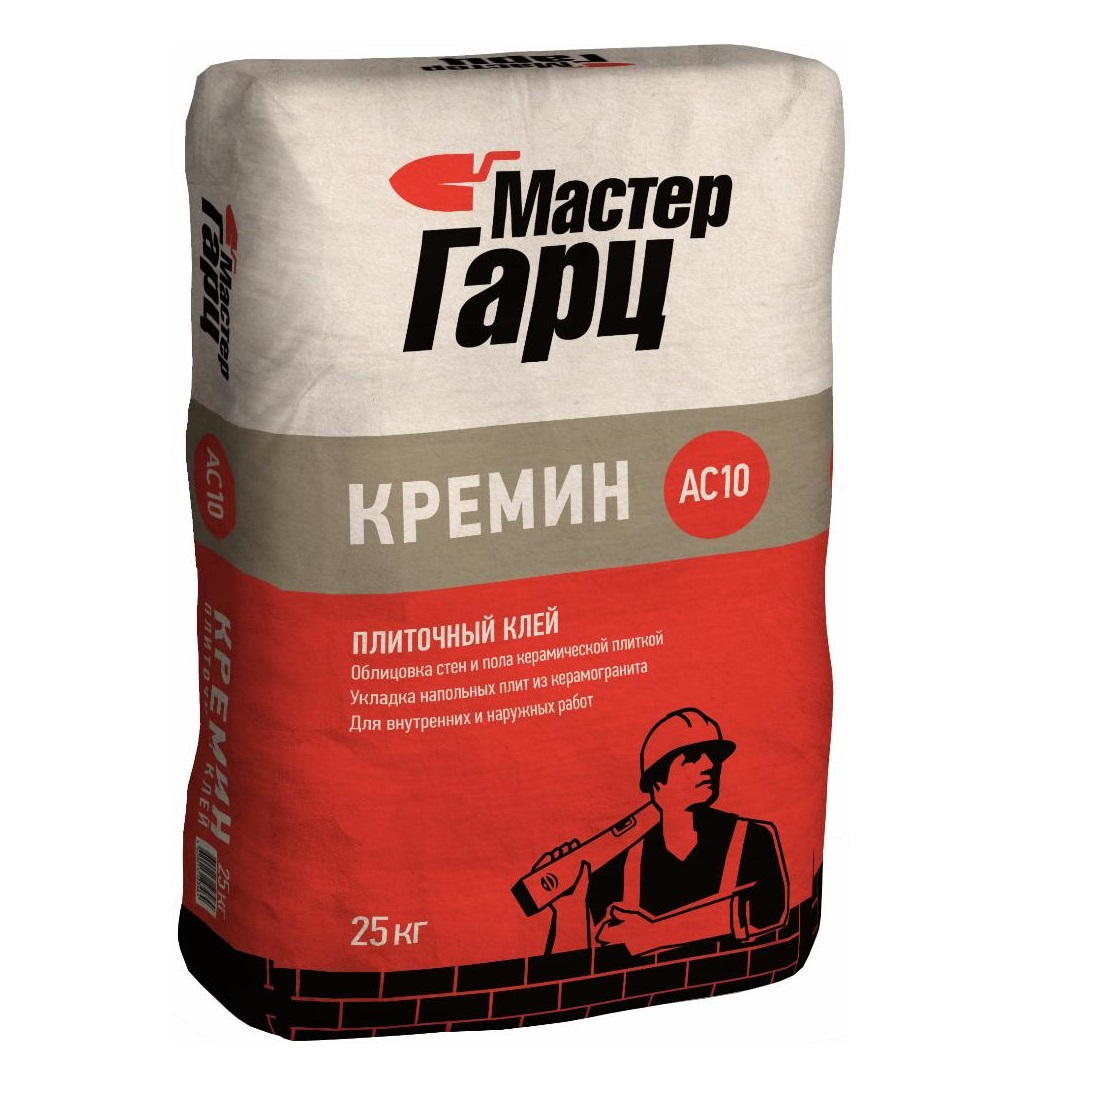 Клей Мастер гарц кремин ас10 25 кг